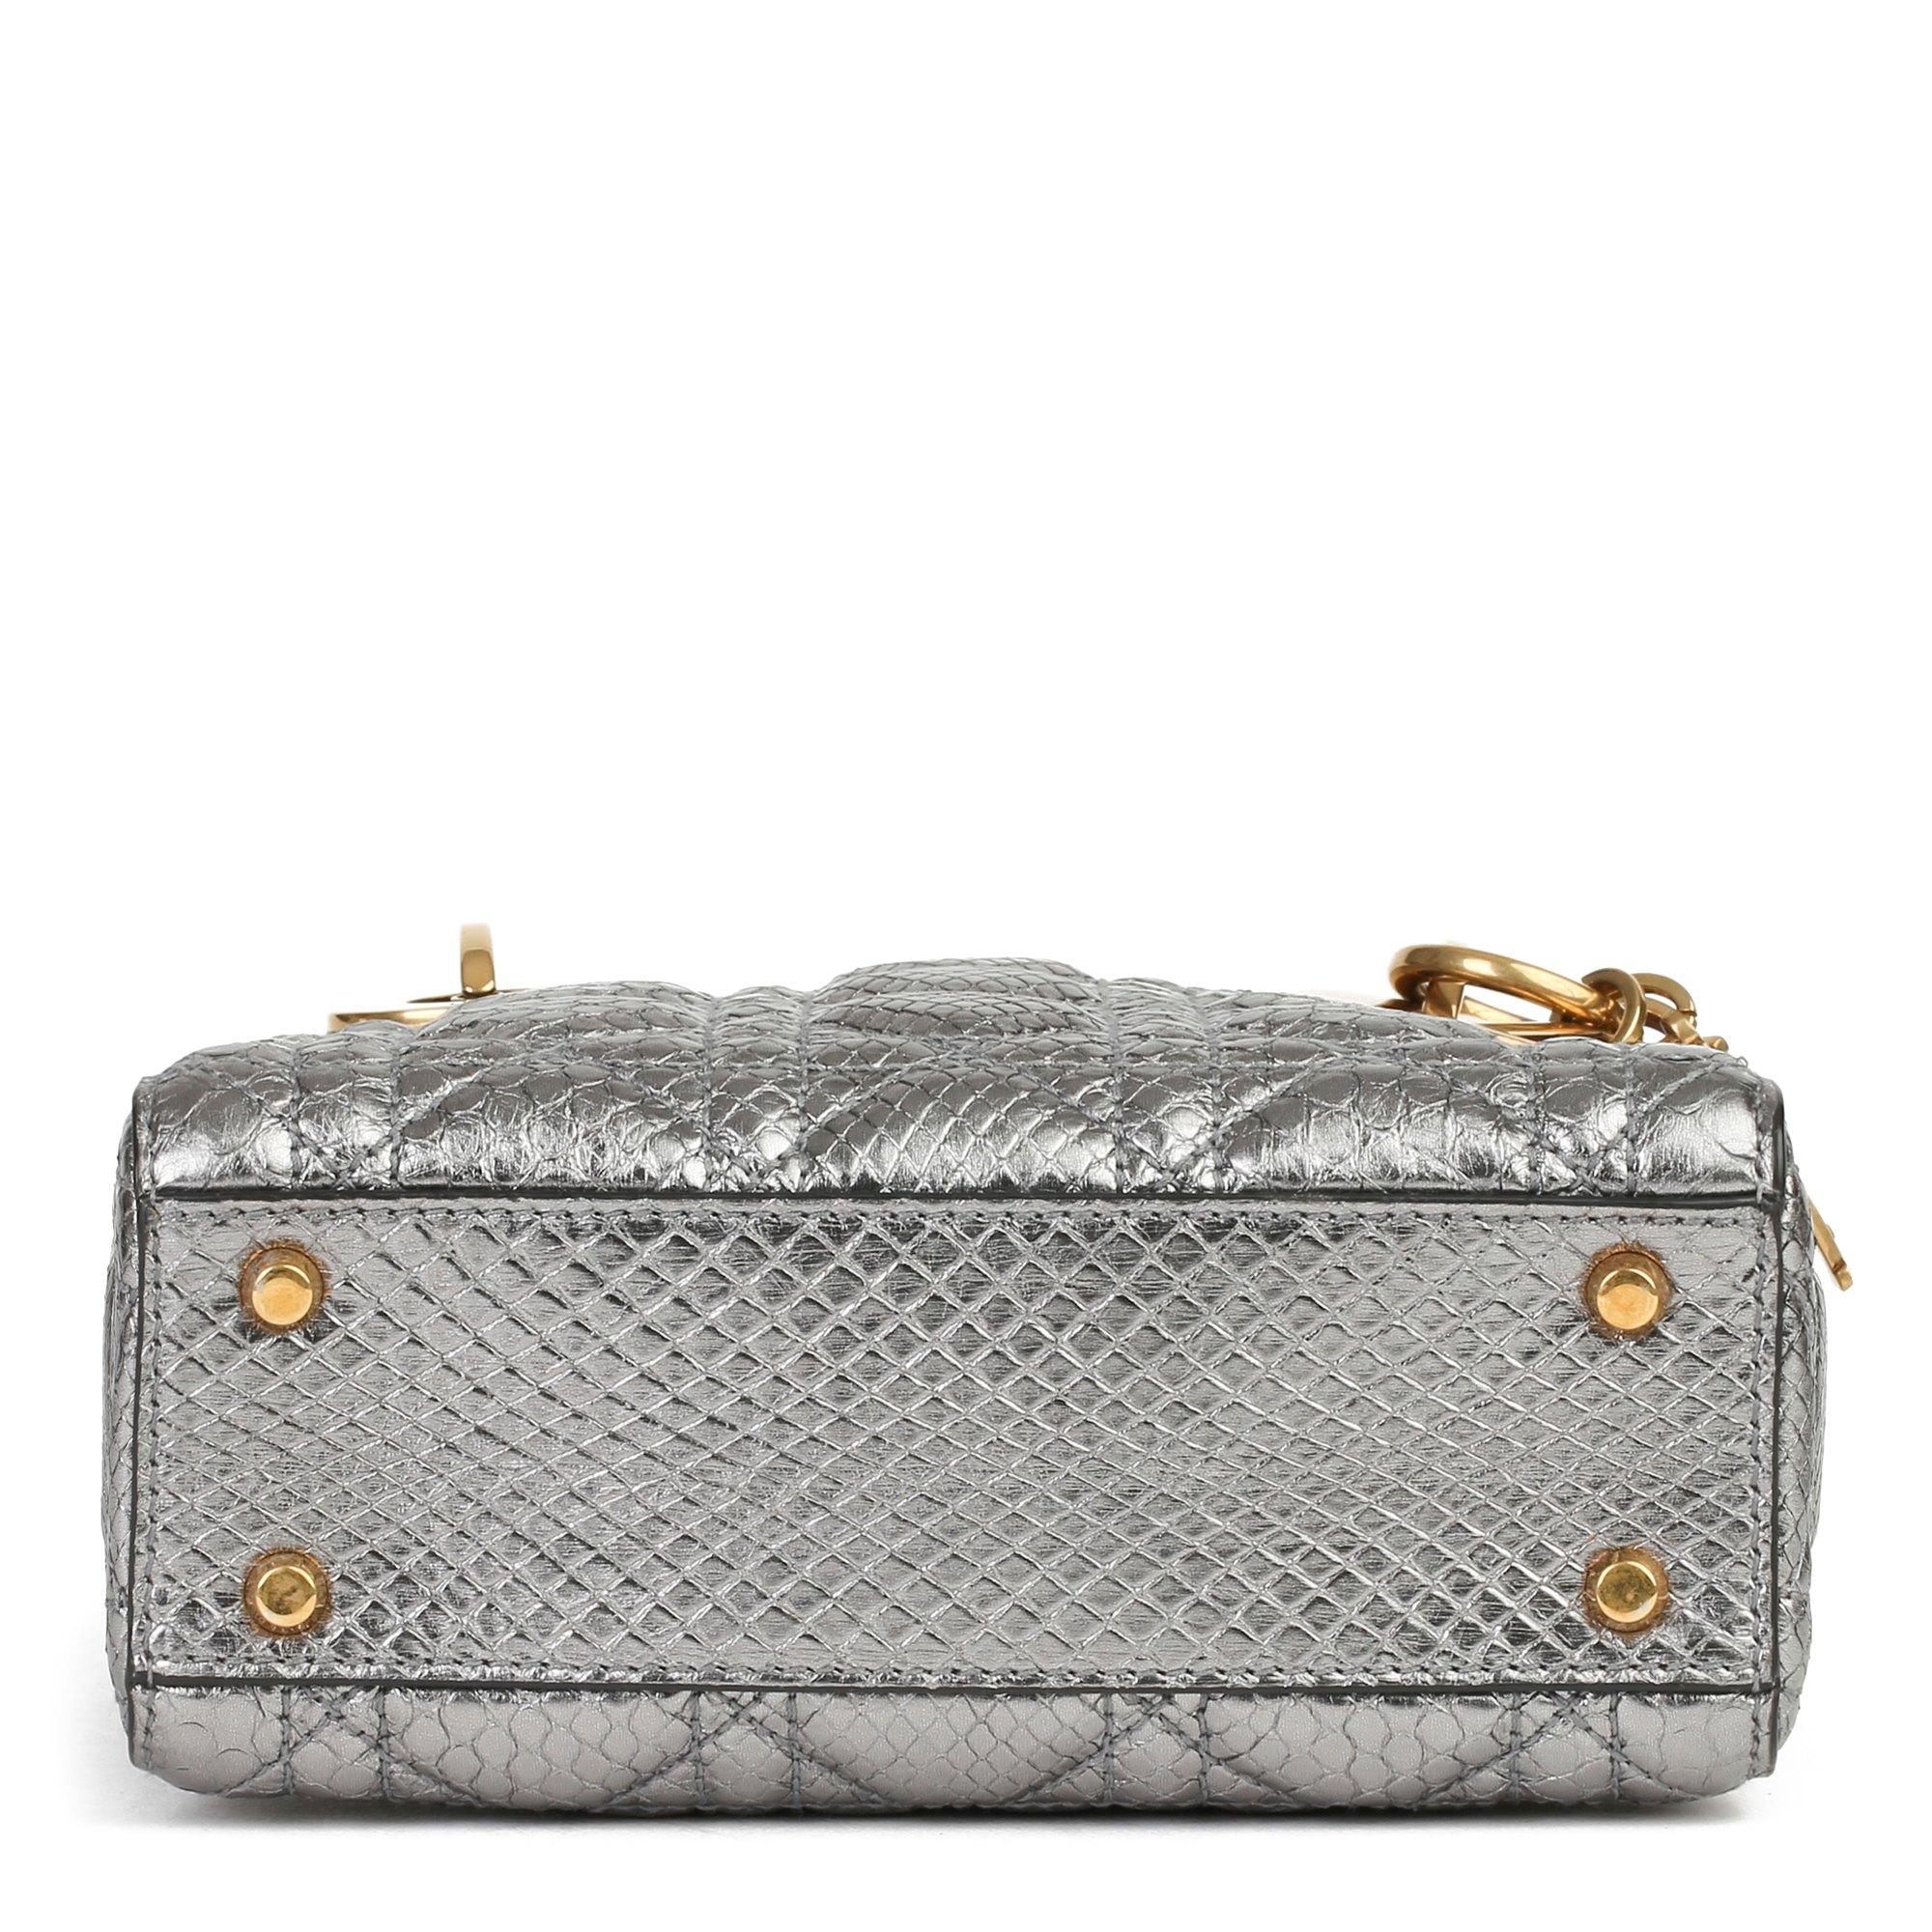 Christian Dior Gunmetal Quilted Metallic Python Leather Mini Lady Dior